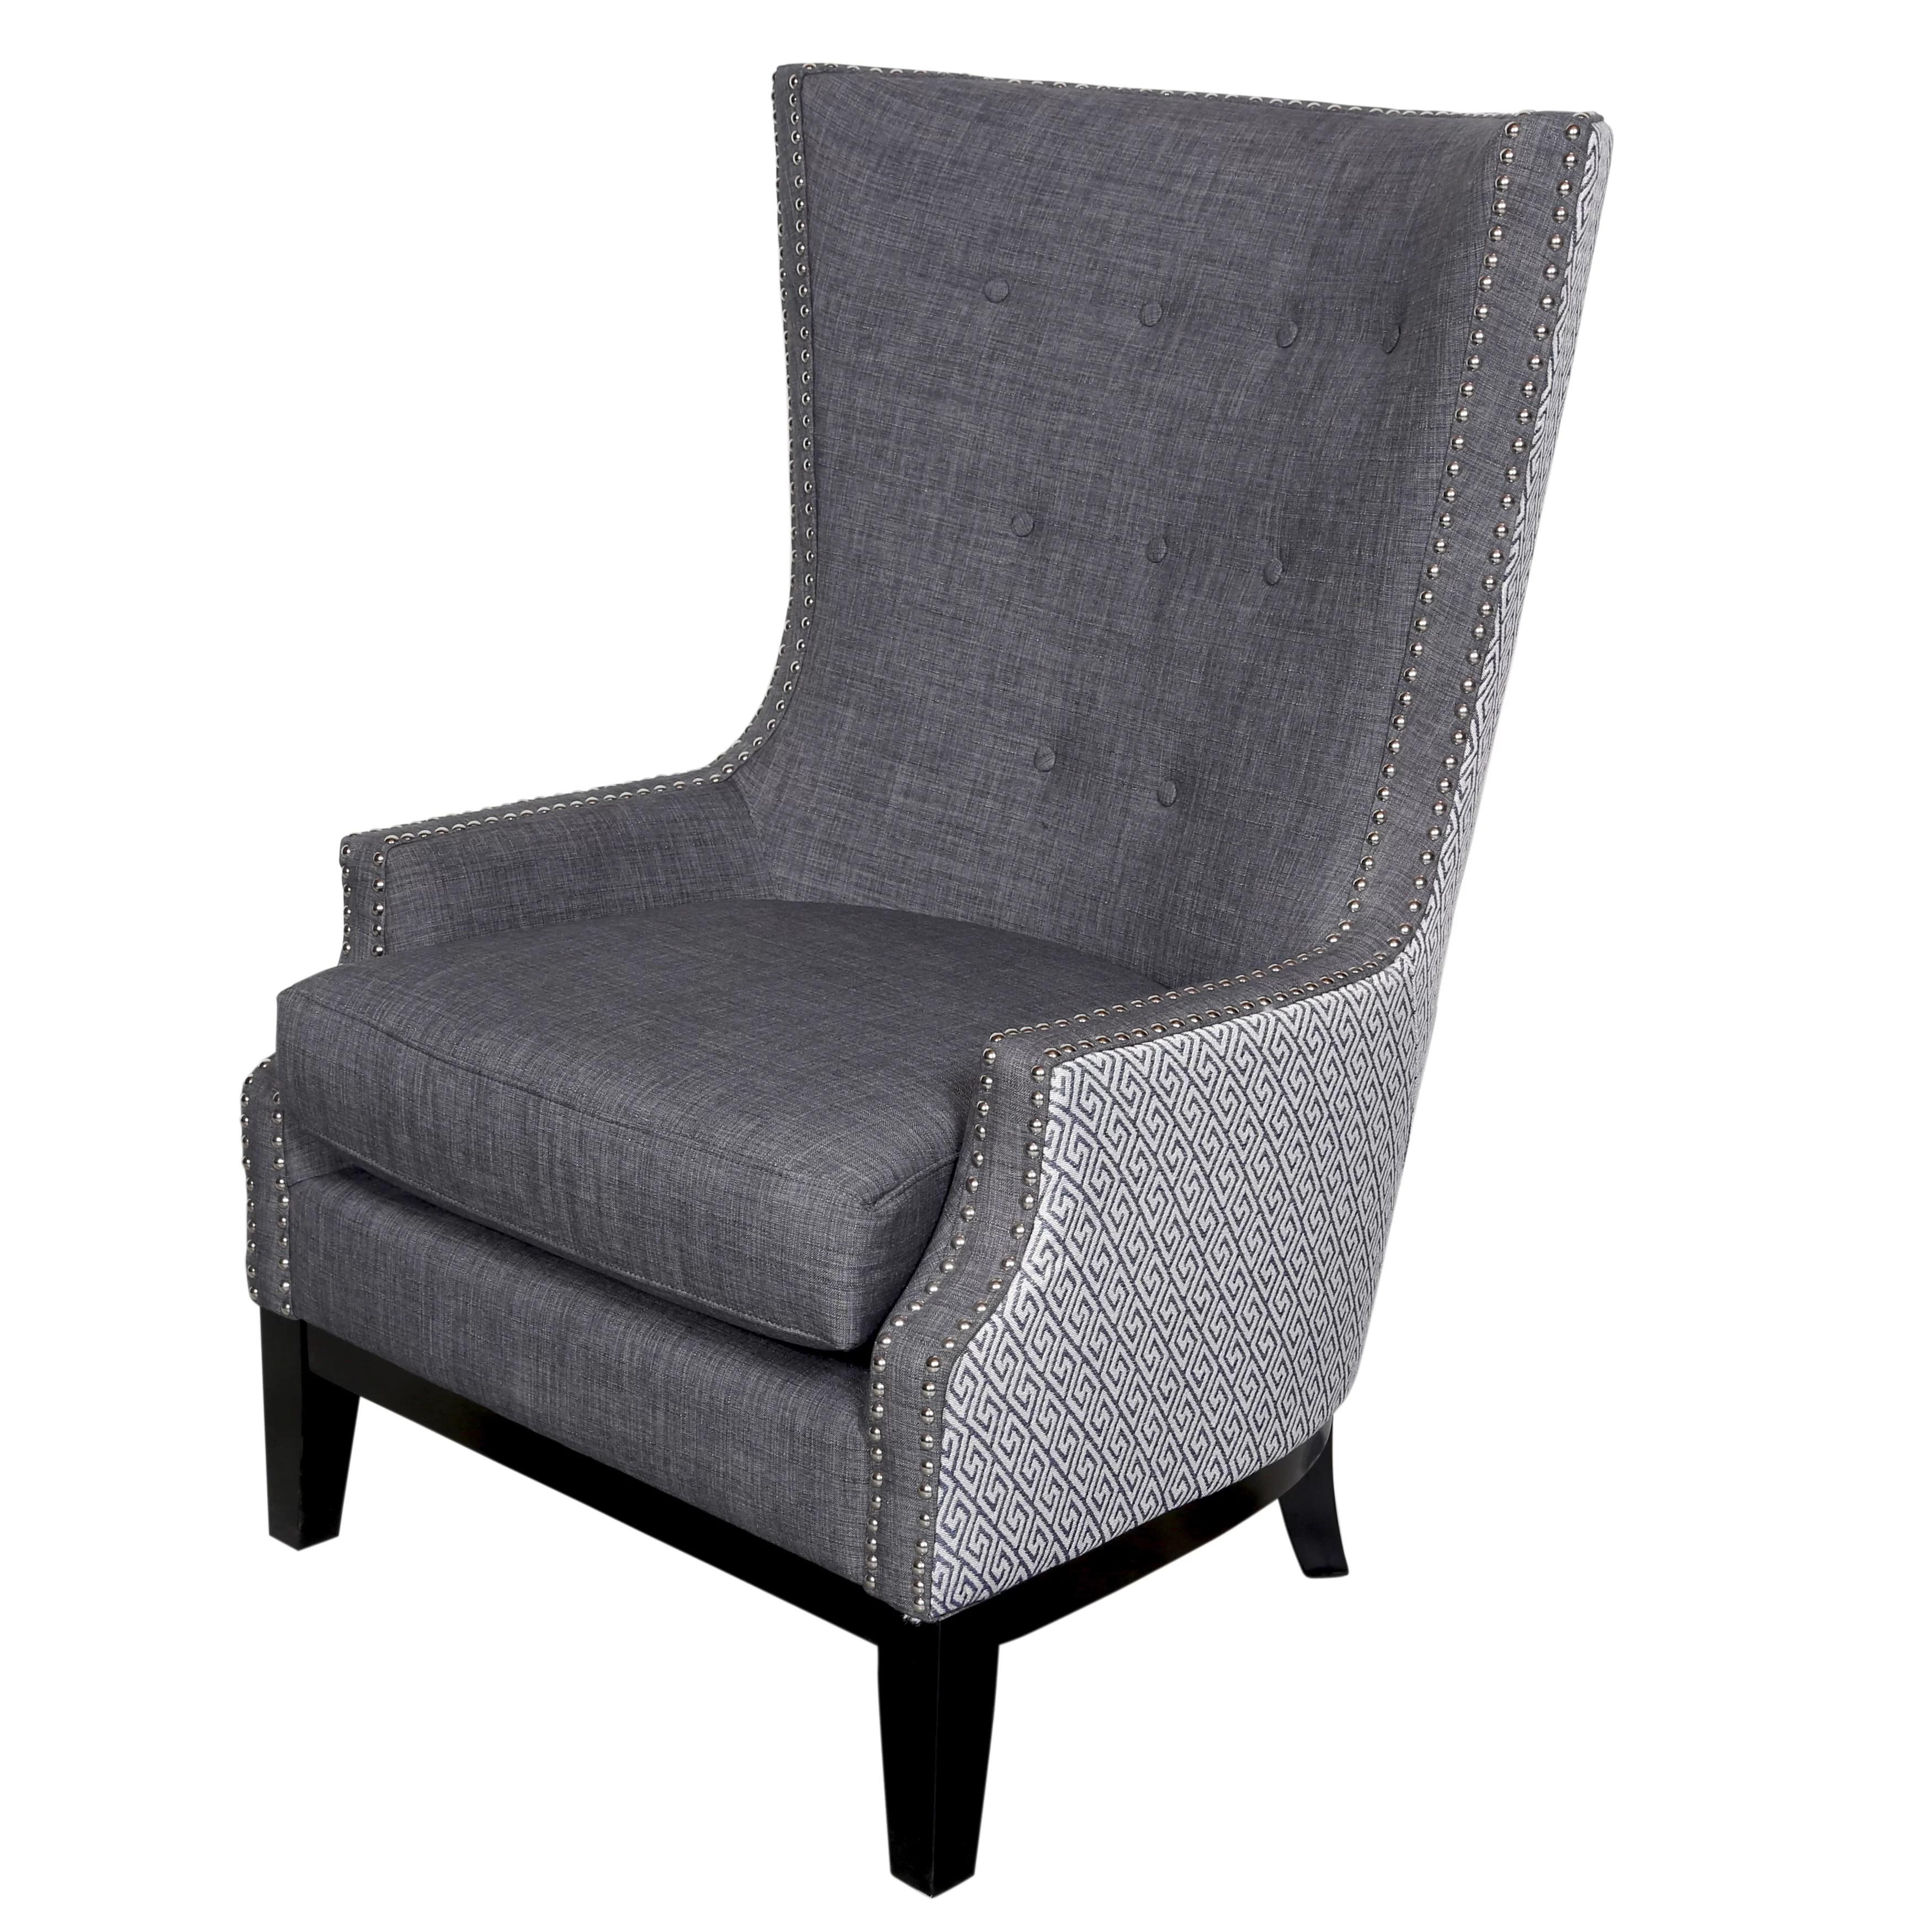 nailhead wingback chair dxracer gaming porter international designs draper arm